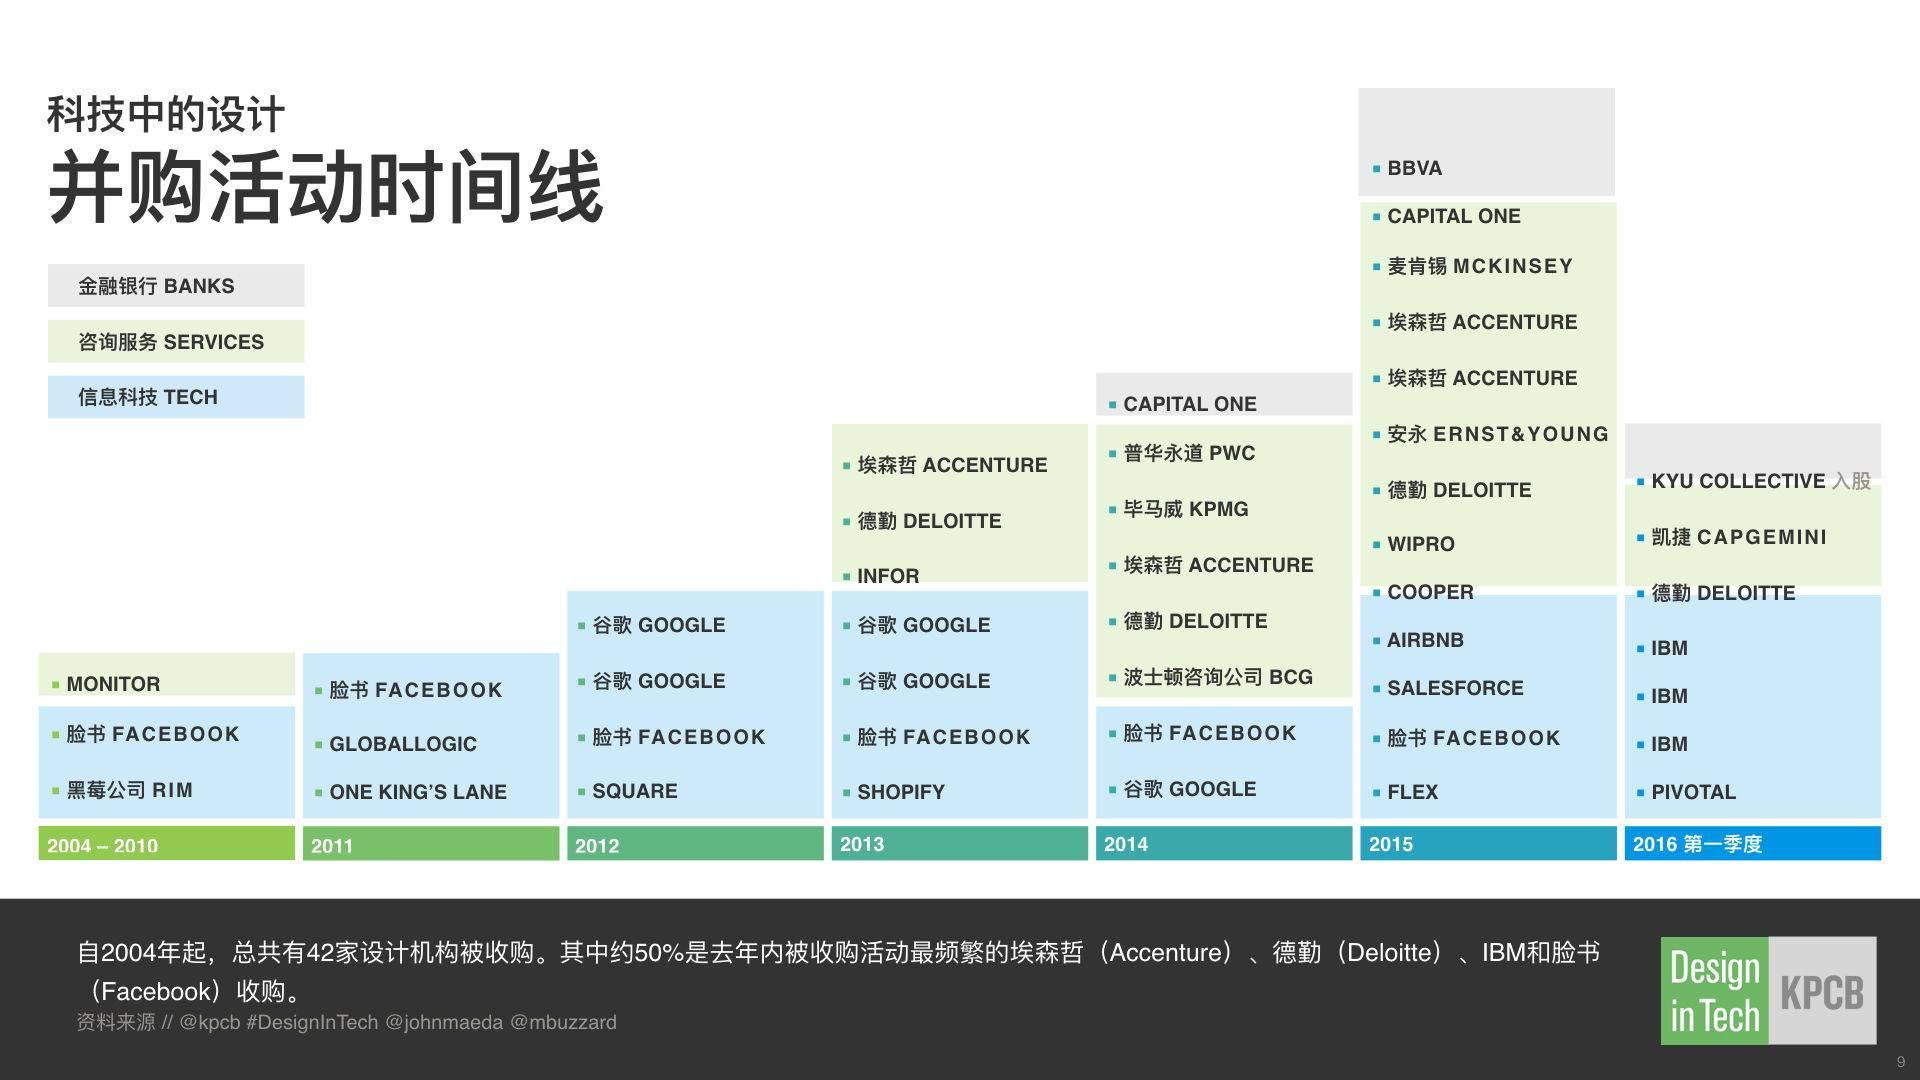 2016DesignInTech科技中的设计(Chinese).009.jpeg